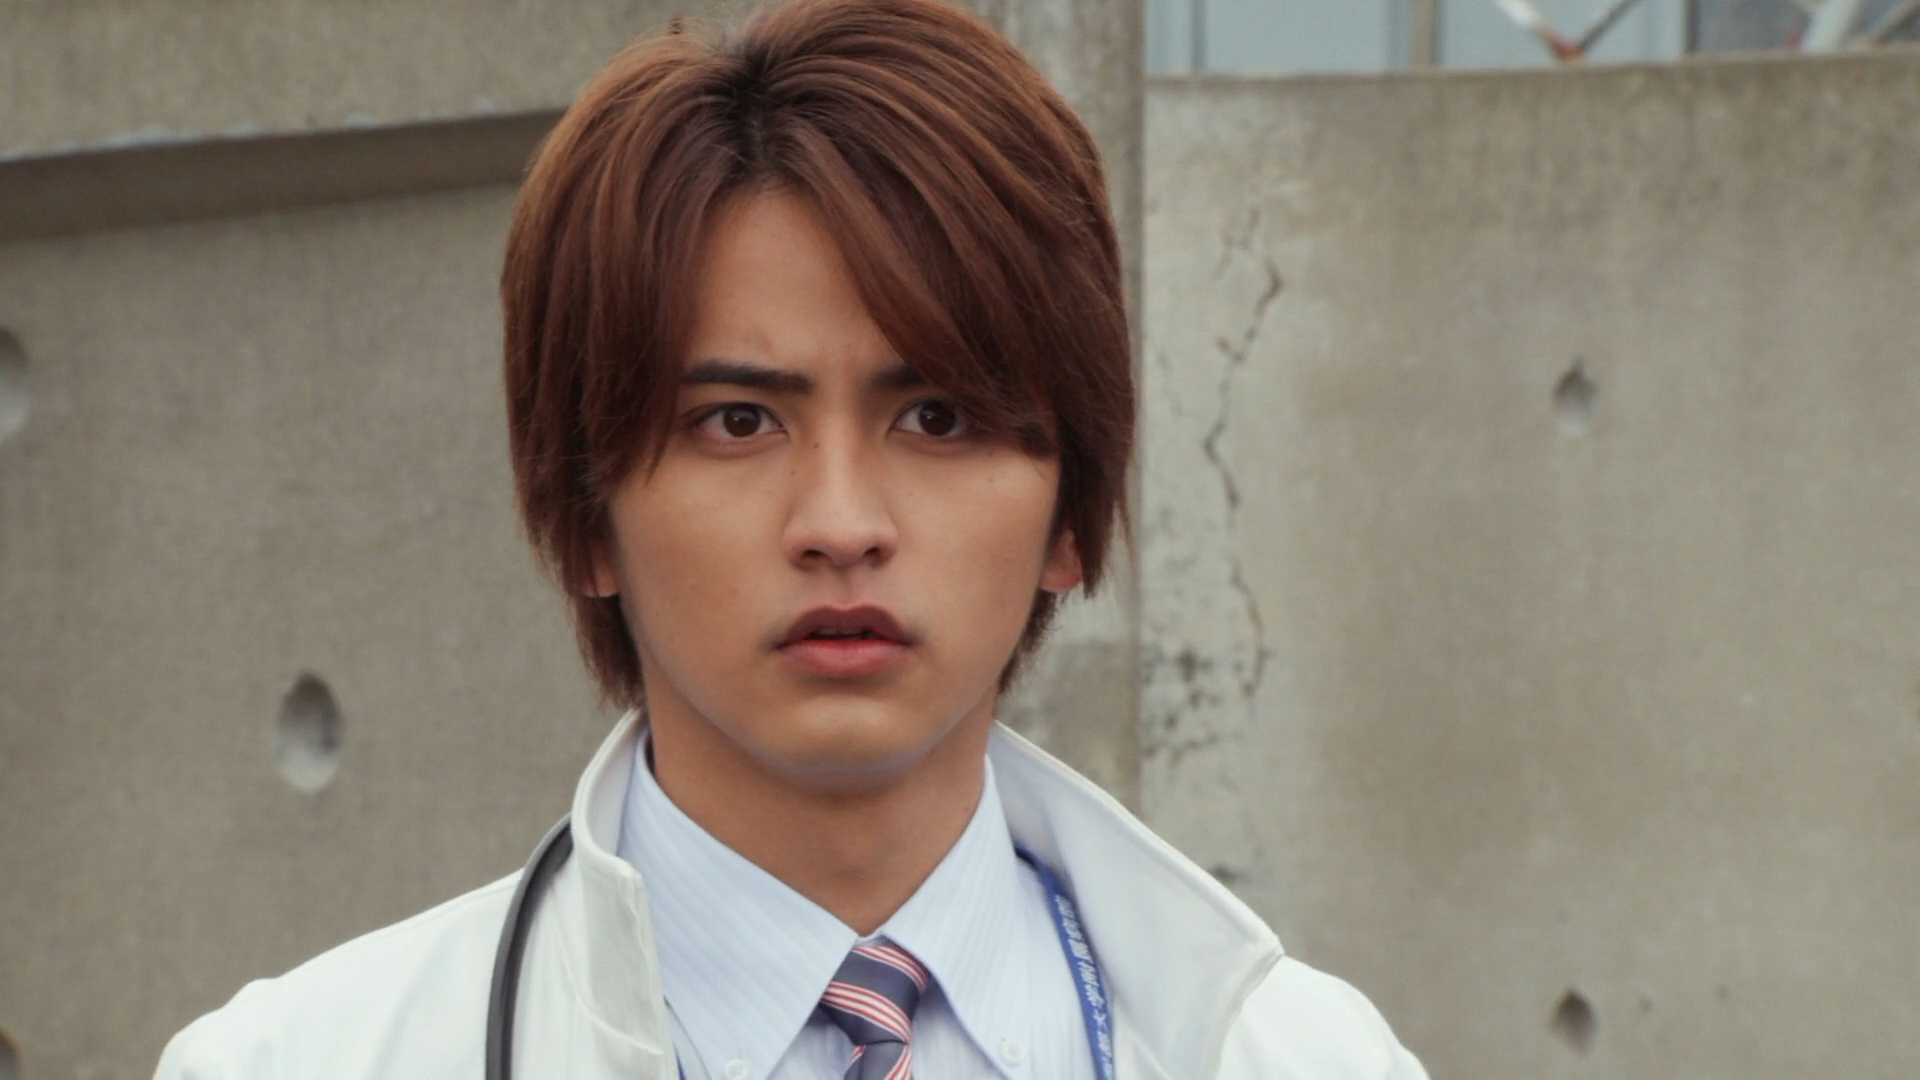 Hiiro Kagami